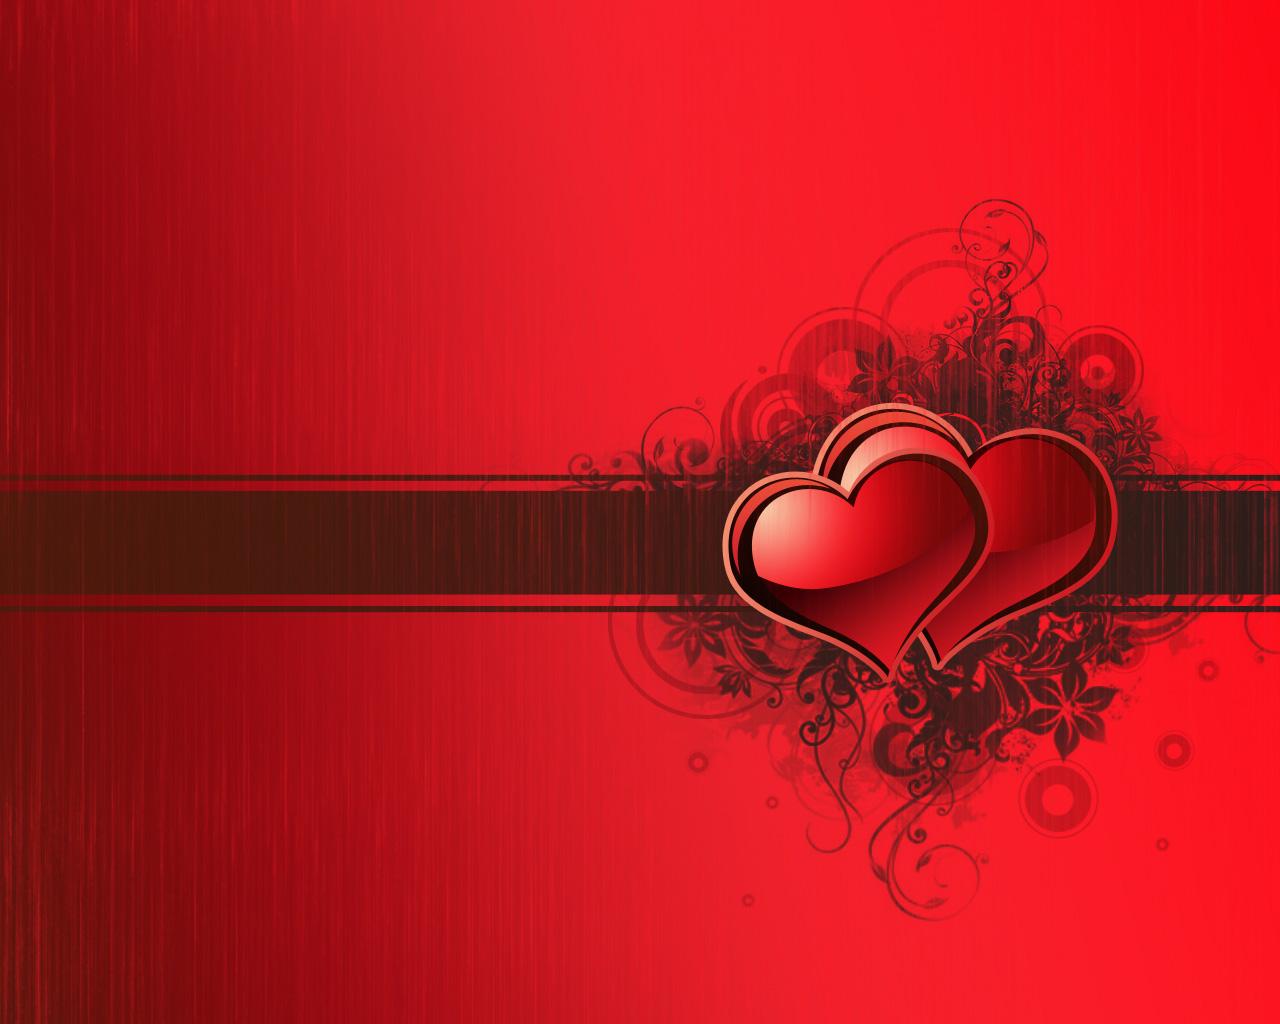 valentines day background wallpaper - photo #21